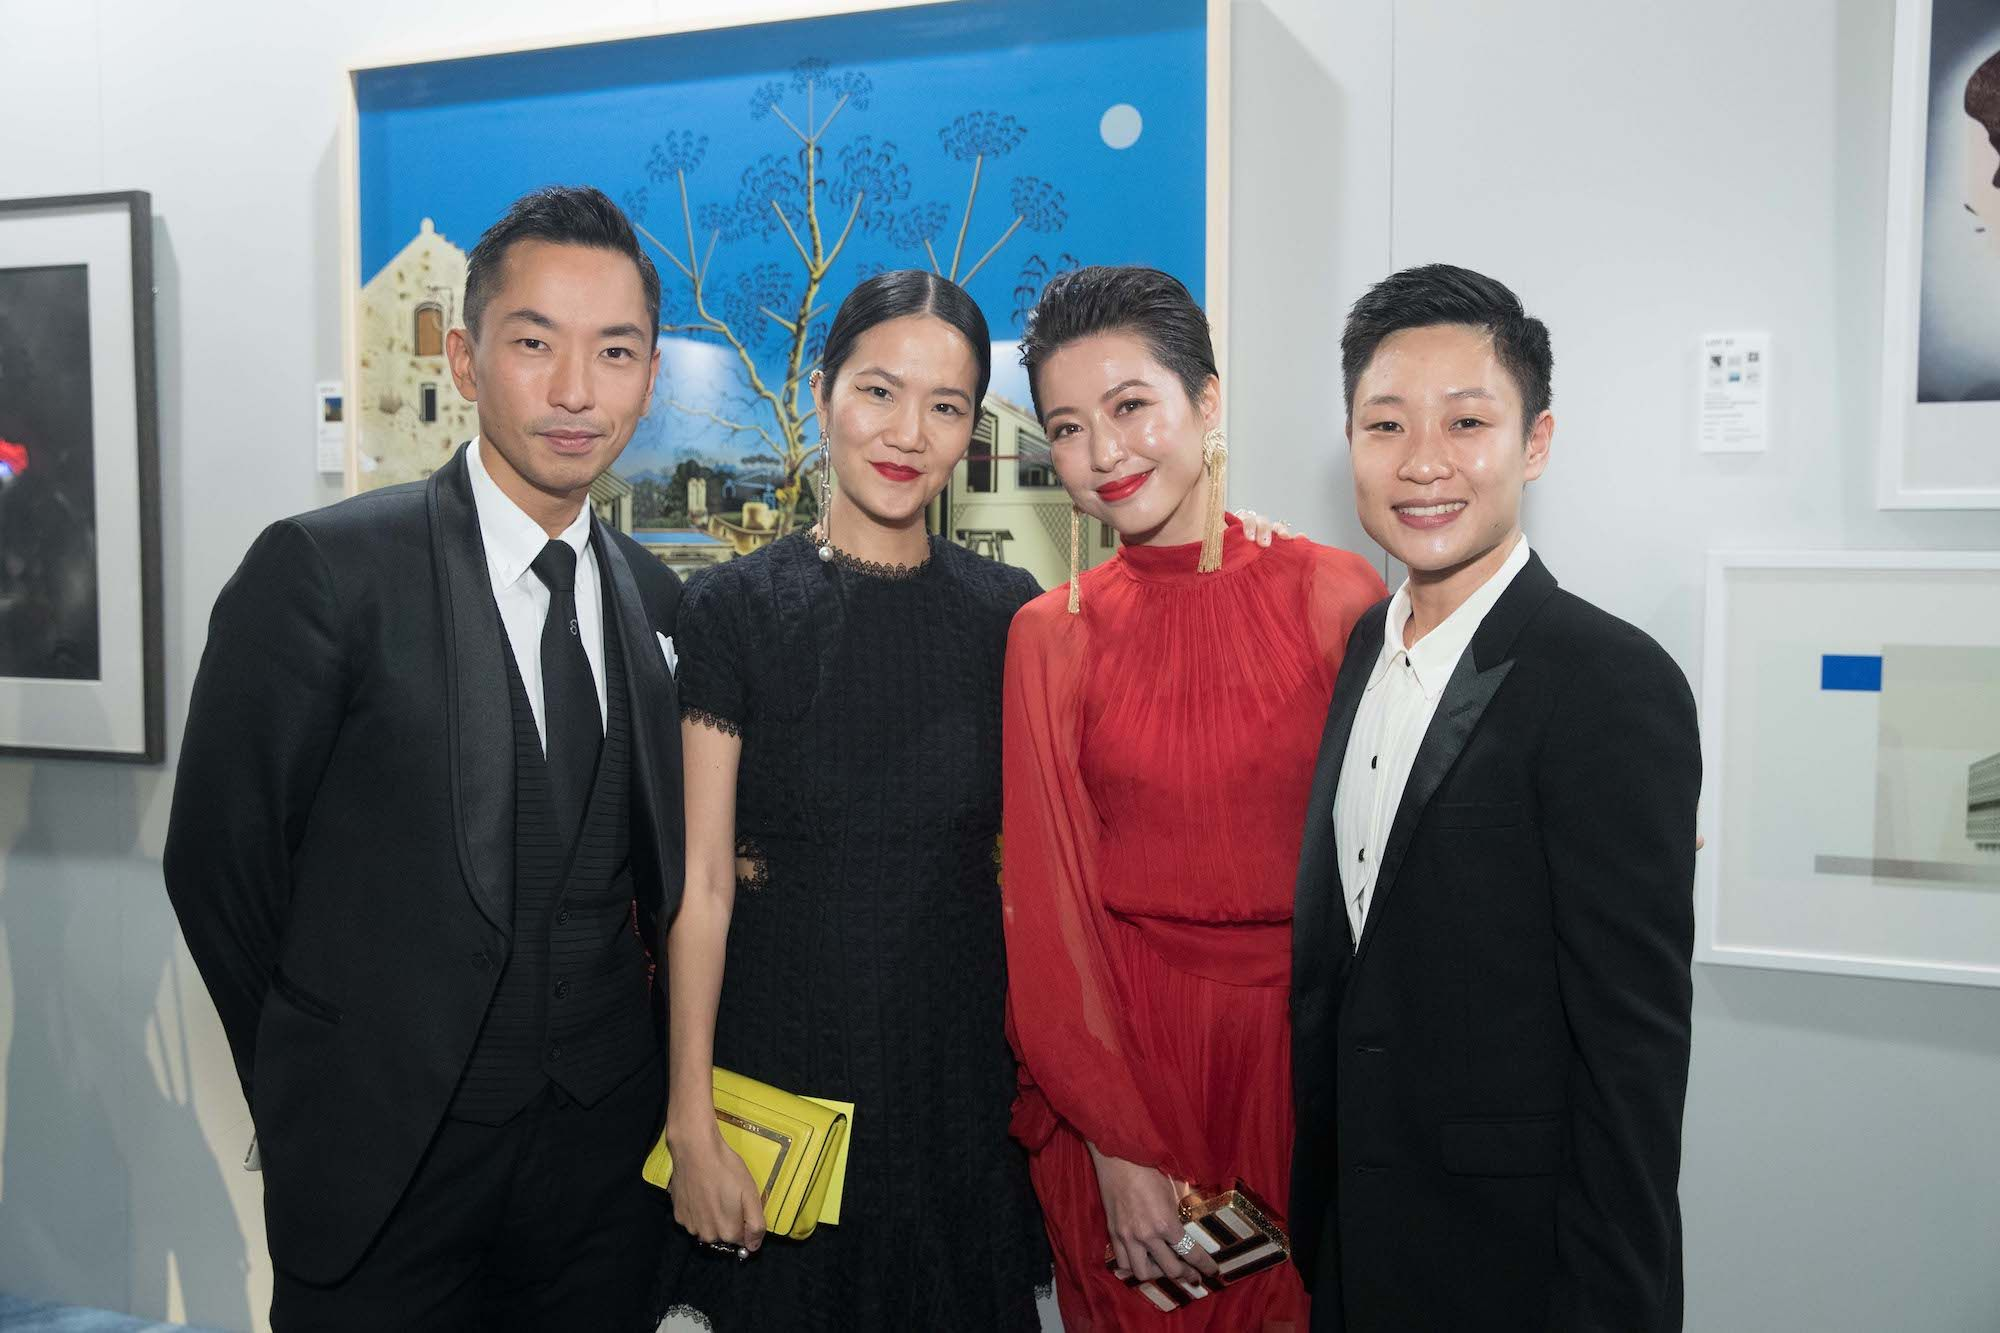 Anson Shum, Grace Lam, Leslie Tang, Bastian Wong